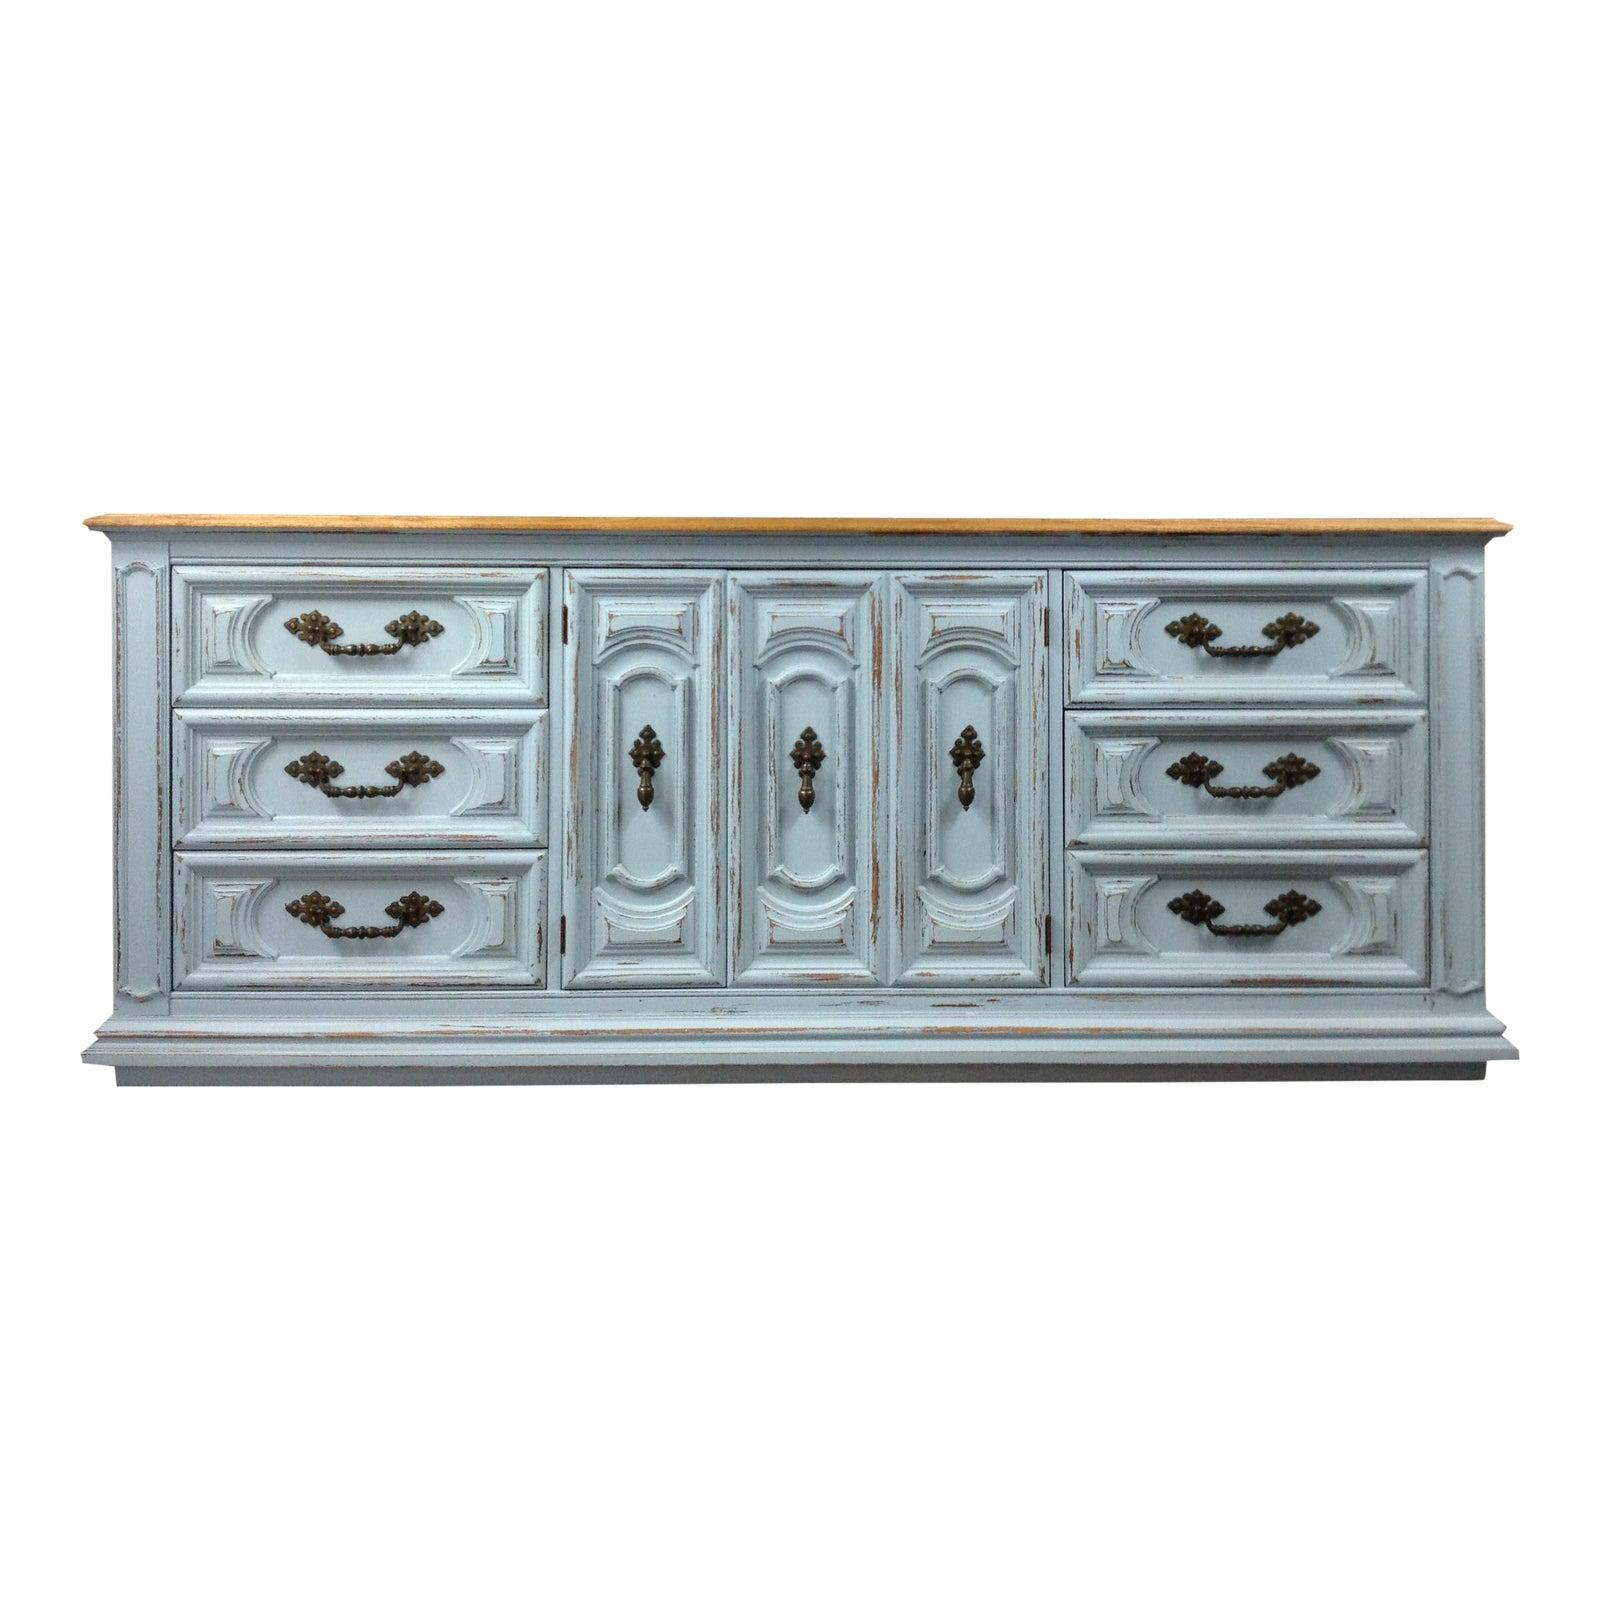 logo shot cobalt a of buffet dresser and feathers furniture emerald distressed iris blue turquoise green art the